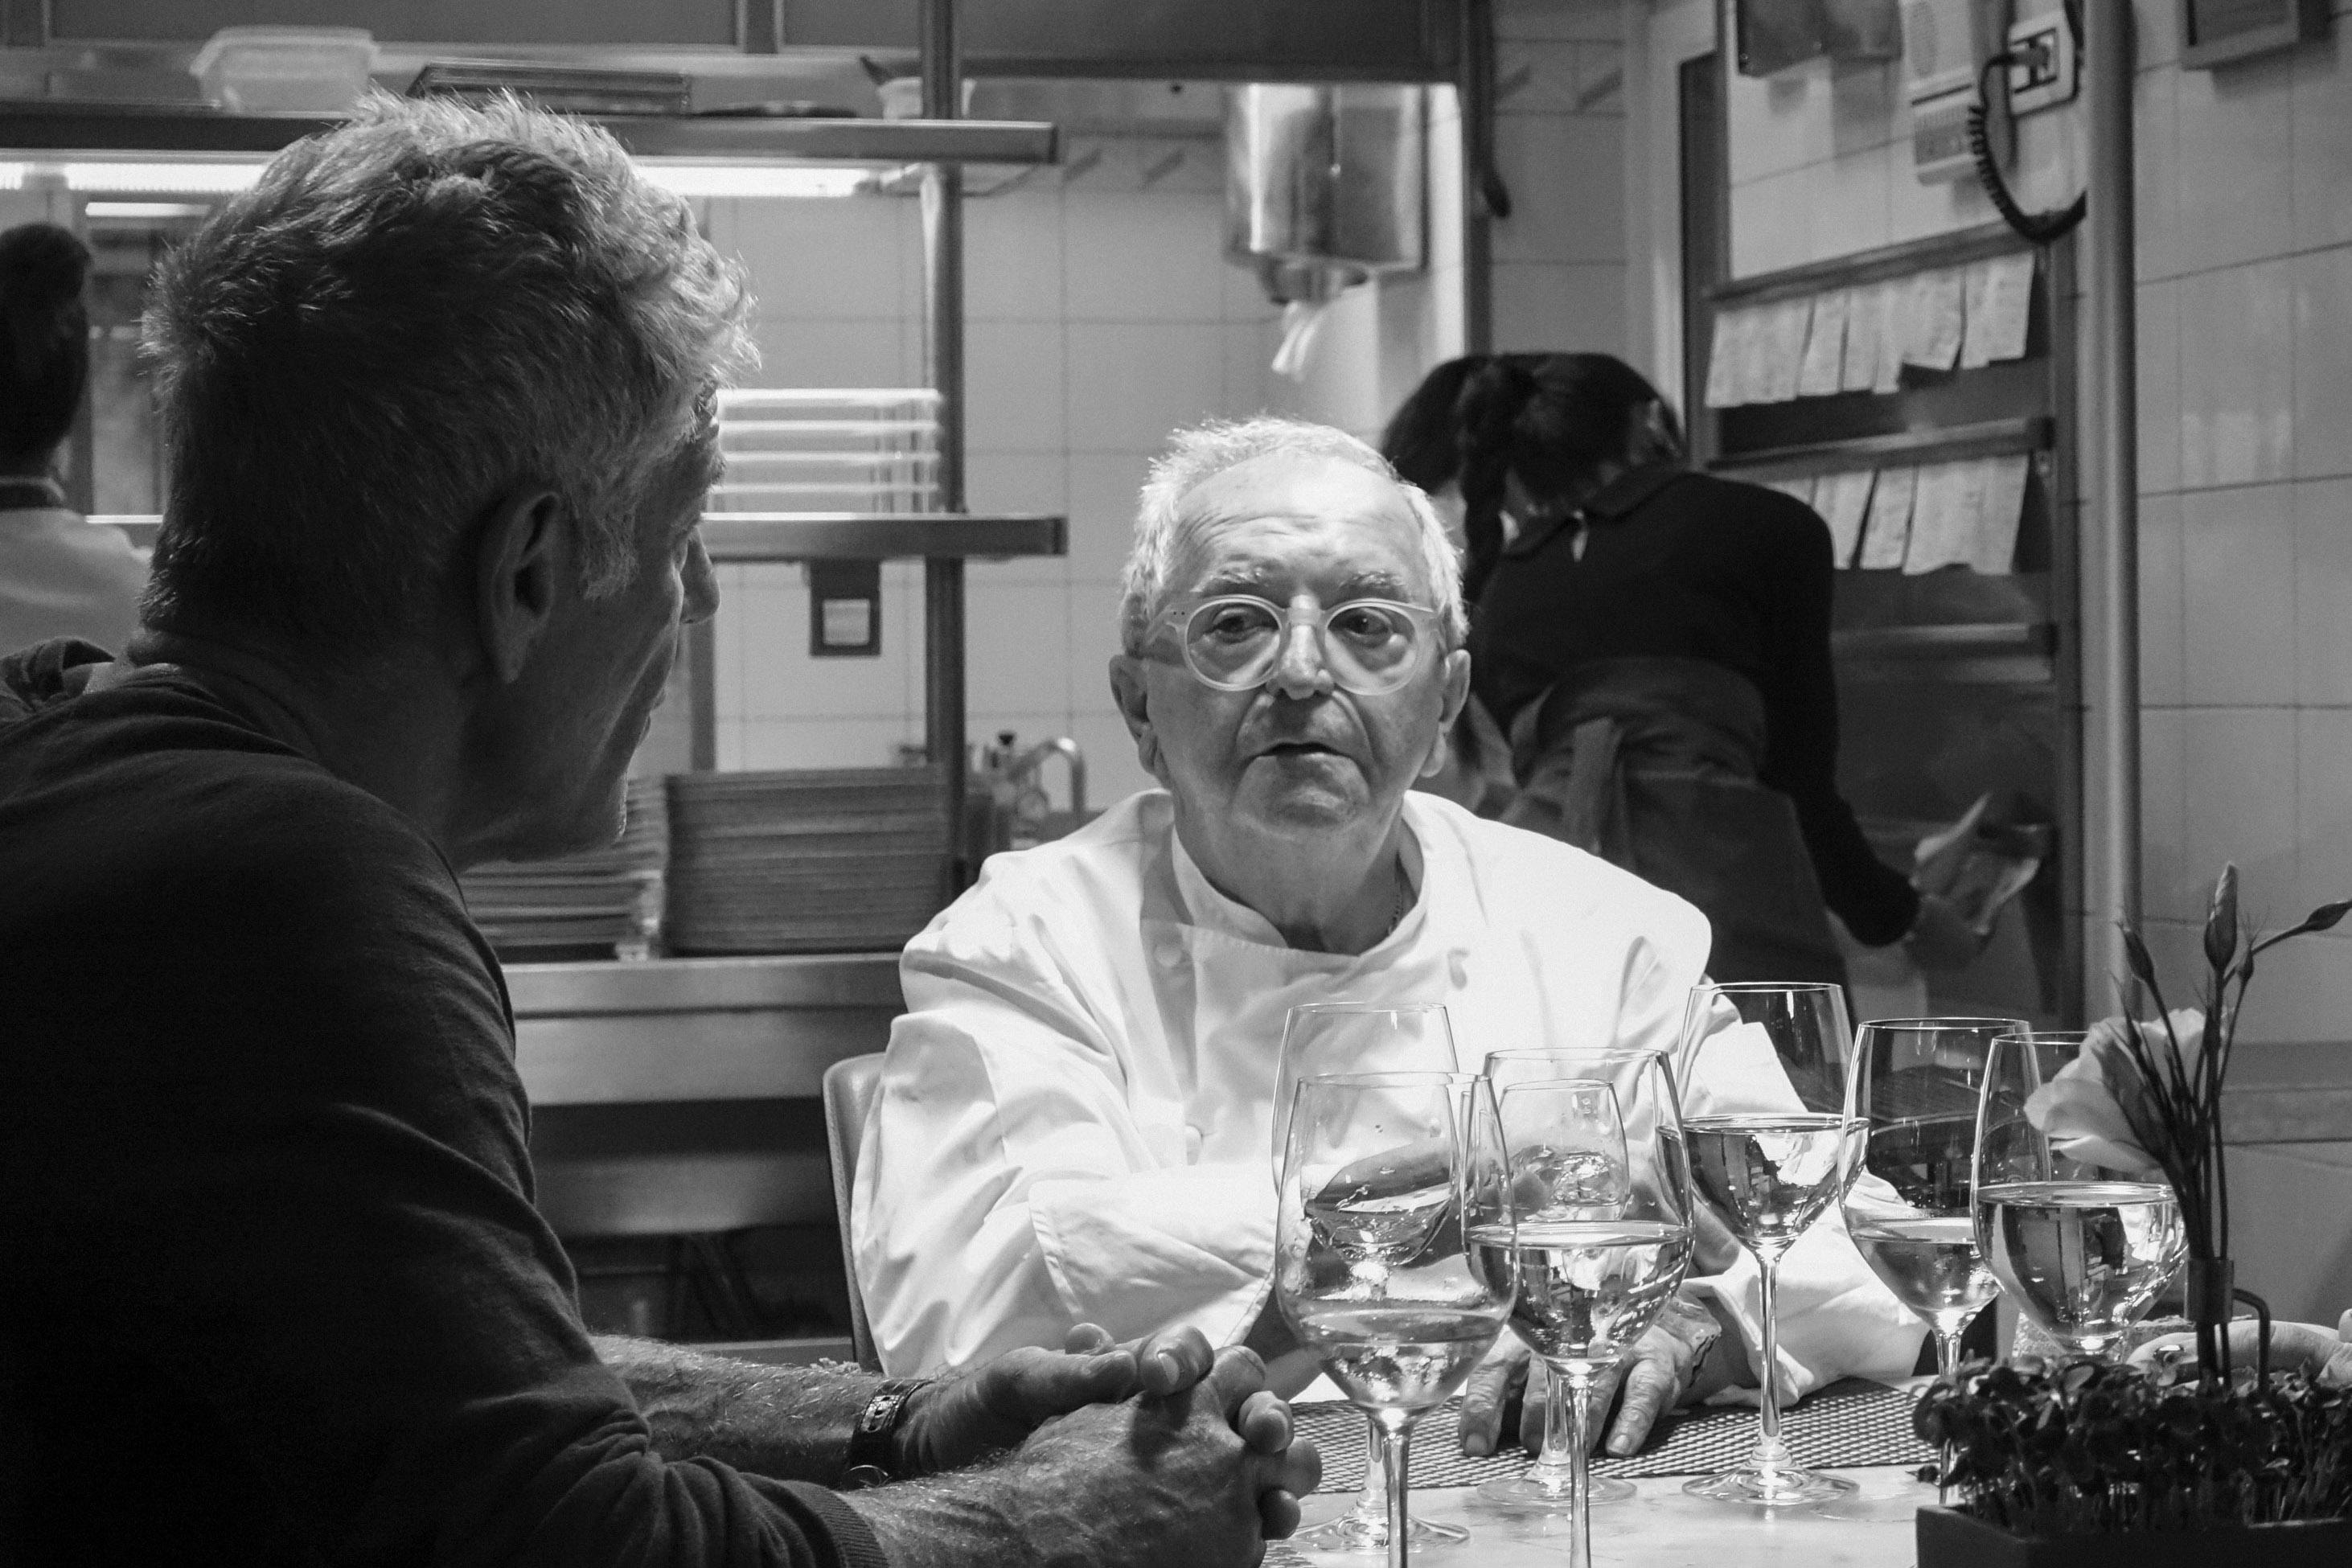 Juan Mari Arzak joins Anthony Bourdain for dinner at his own restaurant, Arzak.